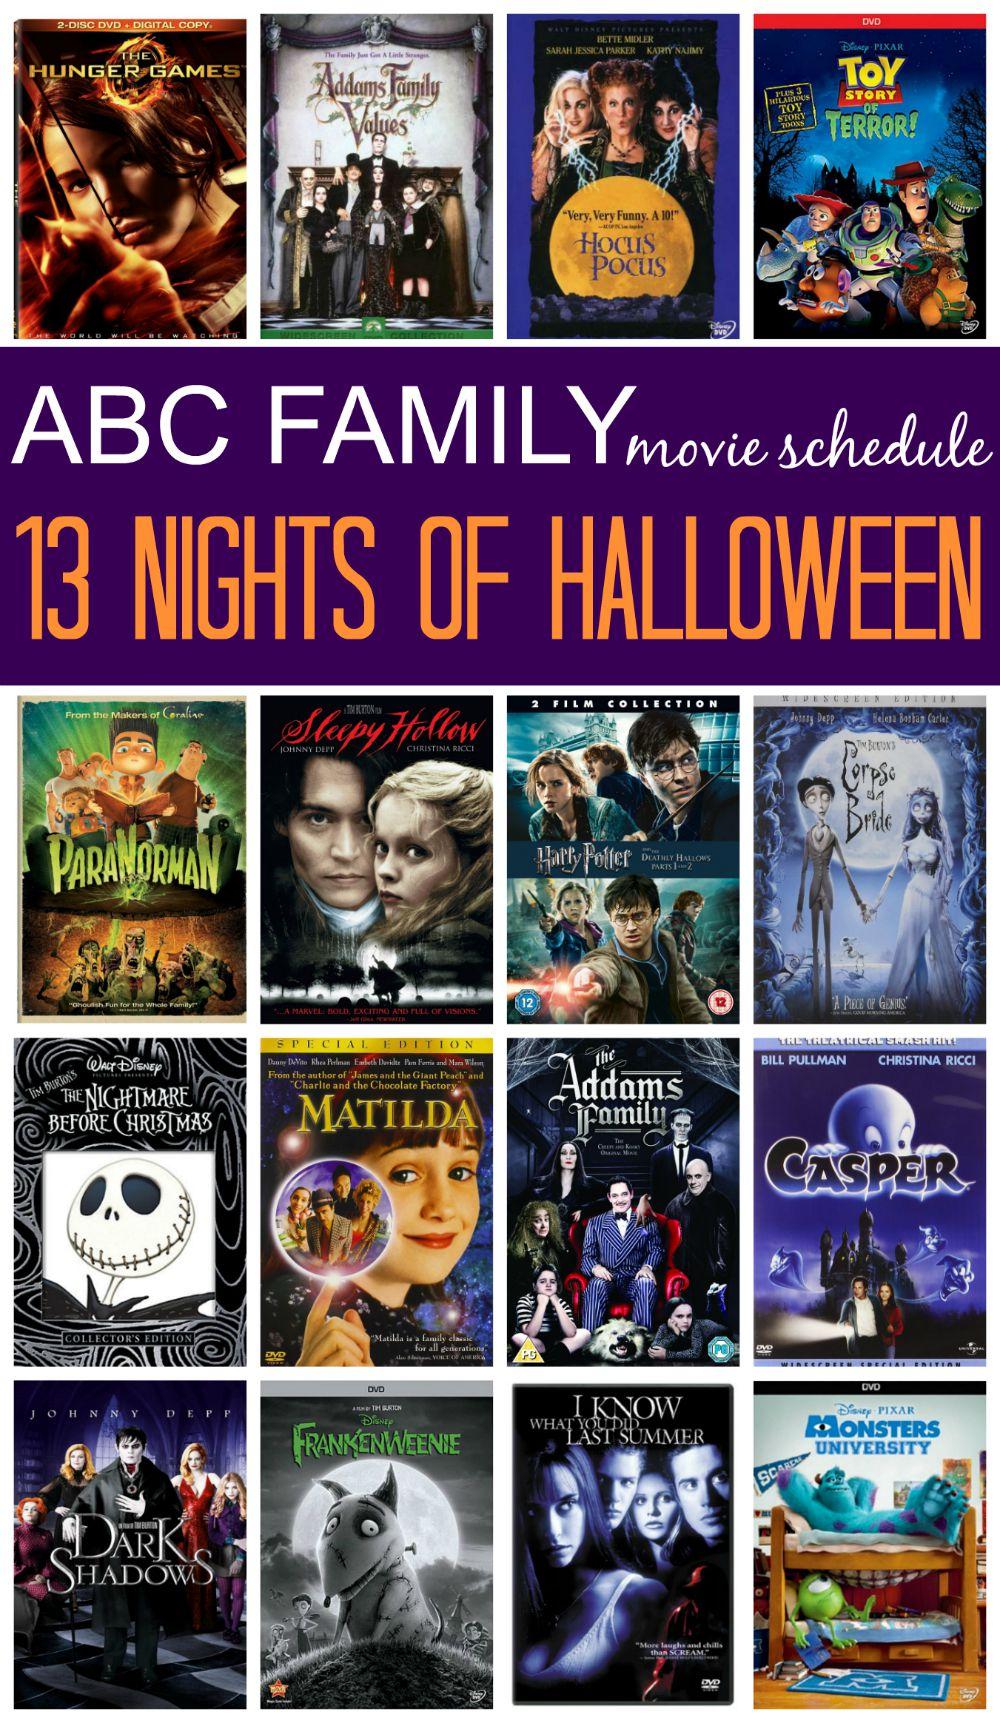 ABC Family 13 Nights of Halloween 2015